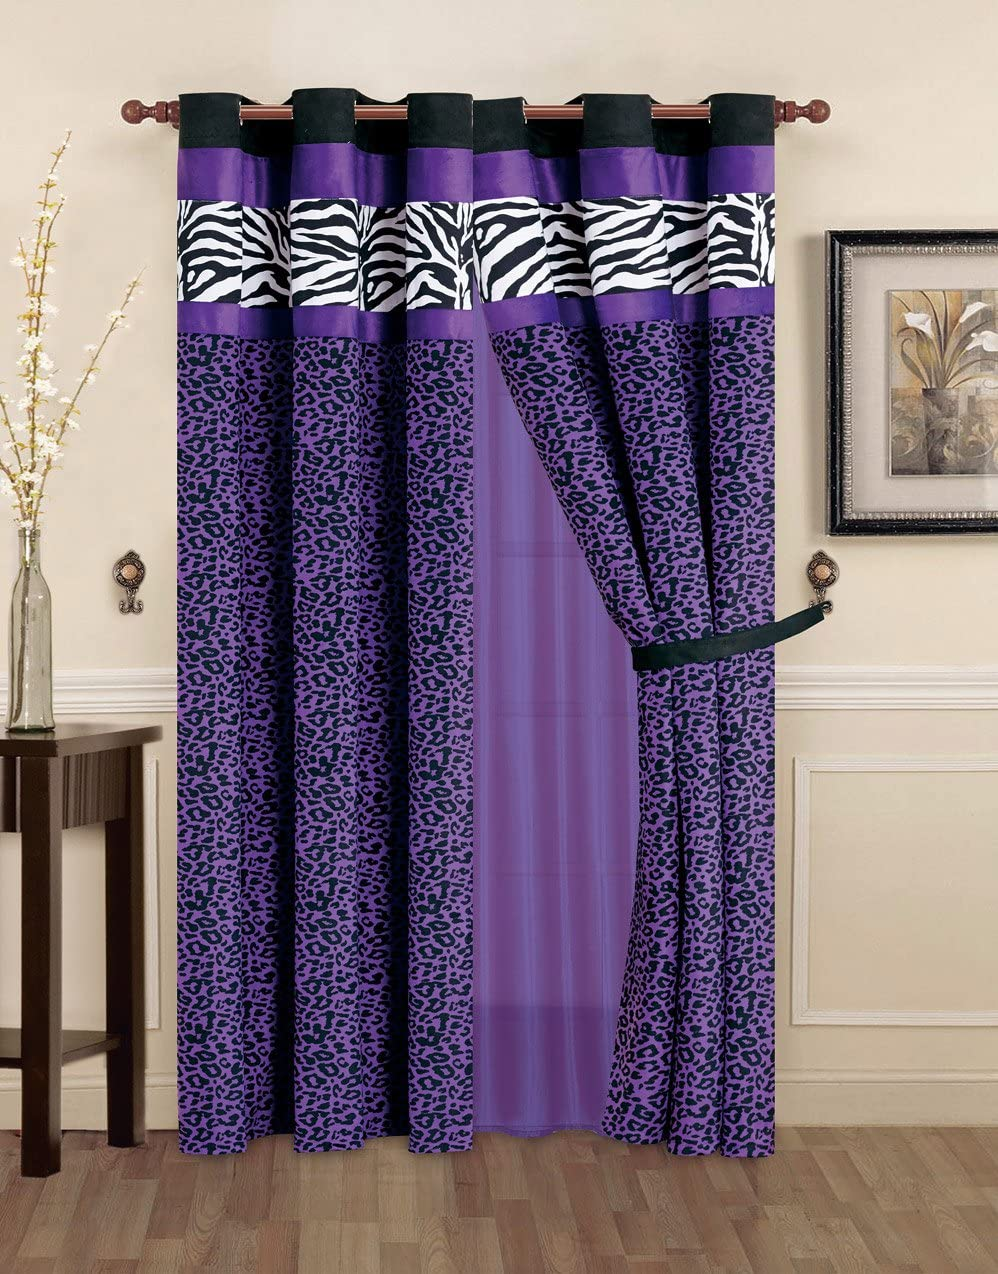 "4 - Piece Grommet Bright Purple Black White Zebra Leopard Micro Fur Curtain Set Drapes/Window Panels 108"" Wide X 84"" Tall"